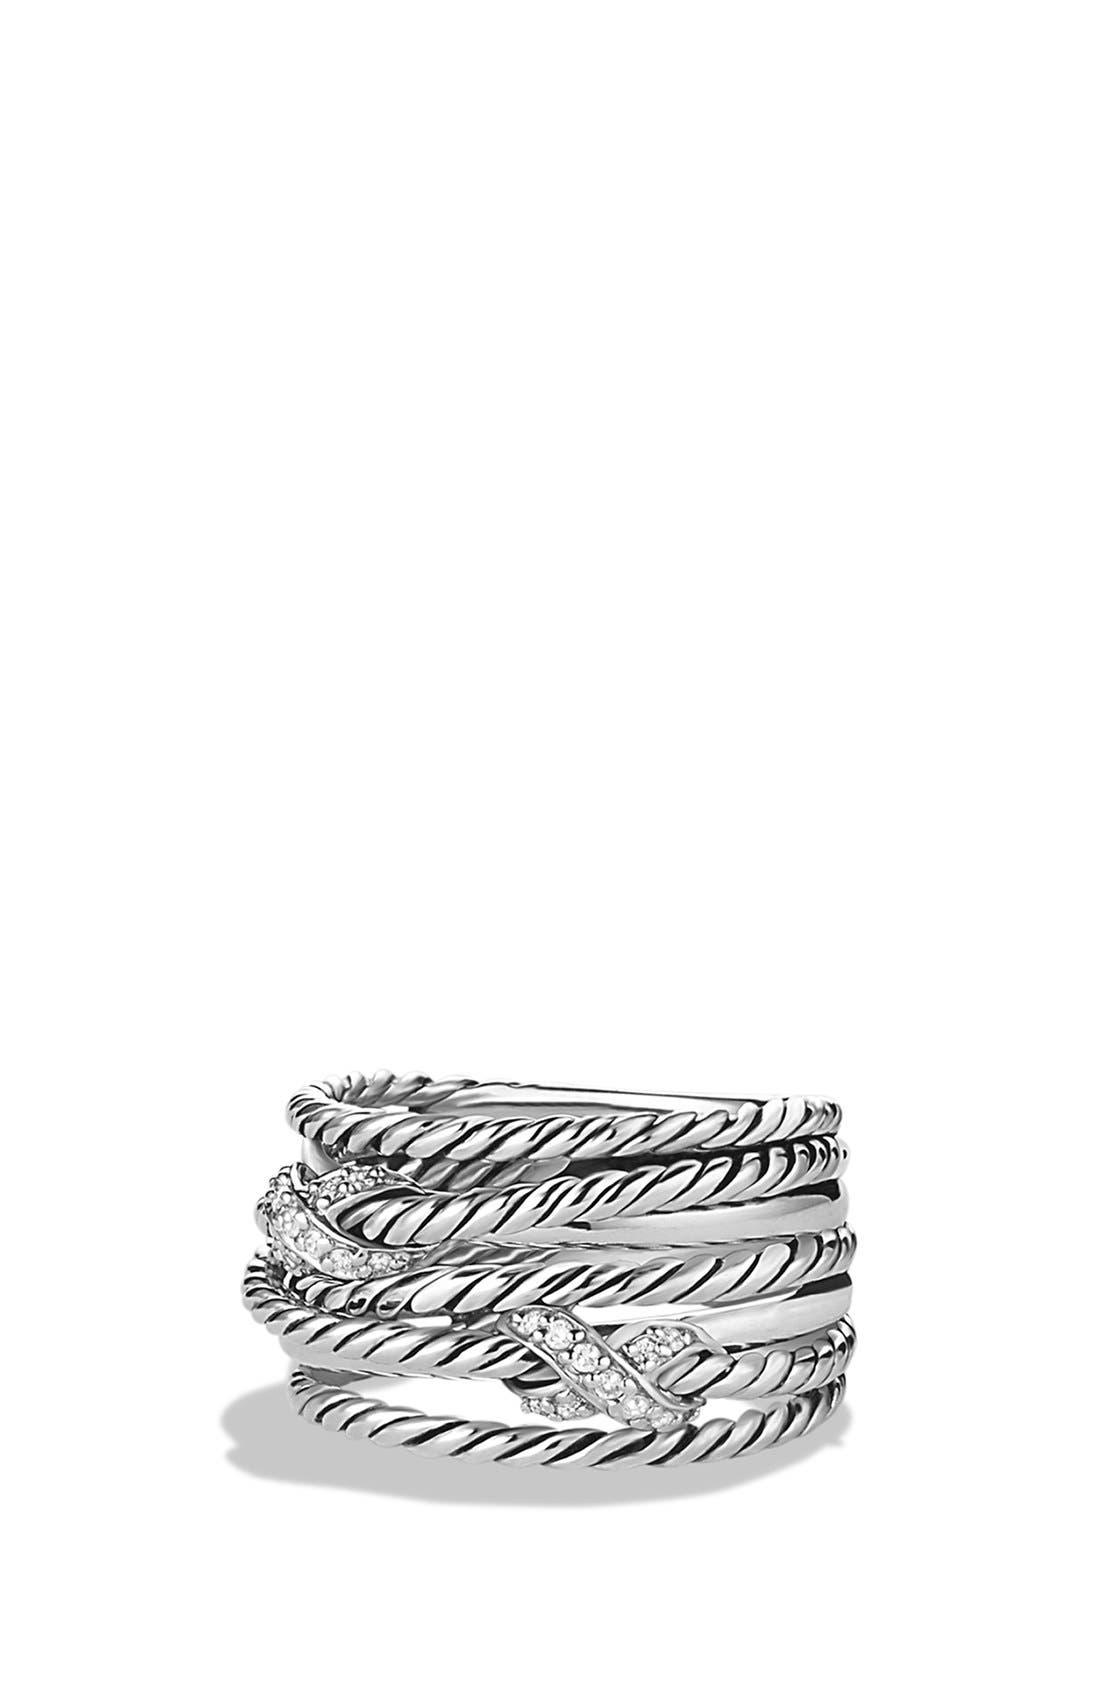 David Yurman Double 'X Crossover' Ring with Diamonds